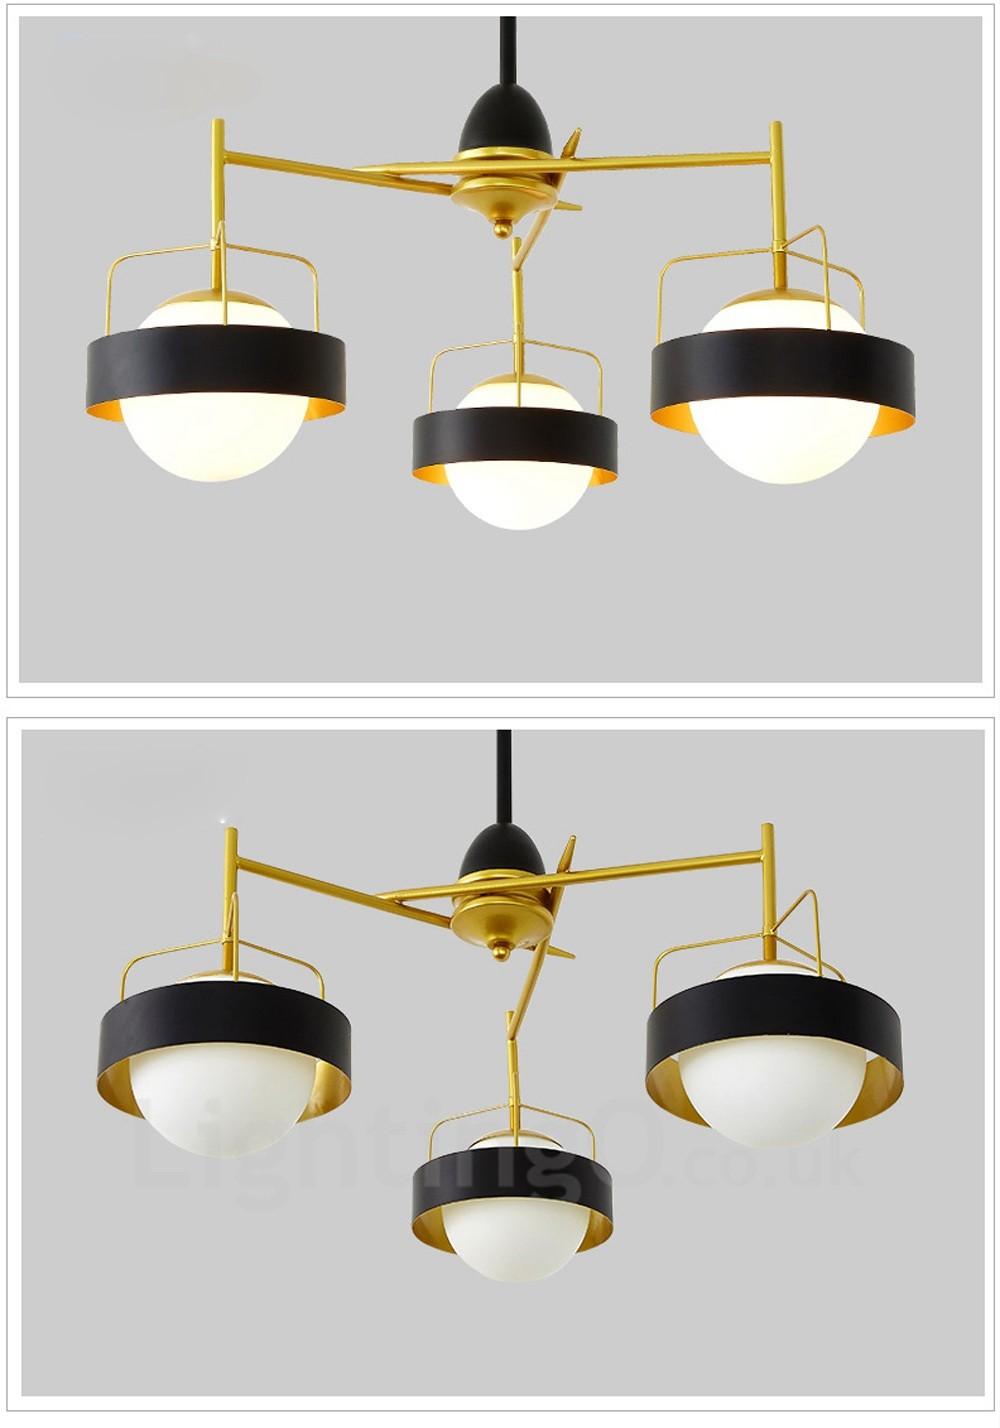 3 Light Modern Contemporary Ceiling Lights Copper